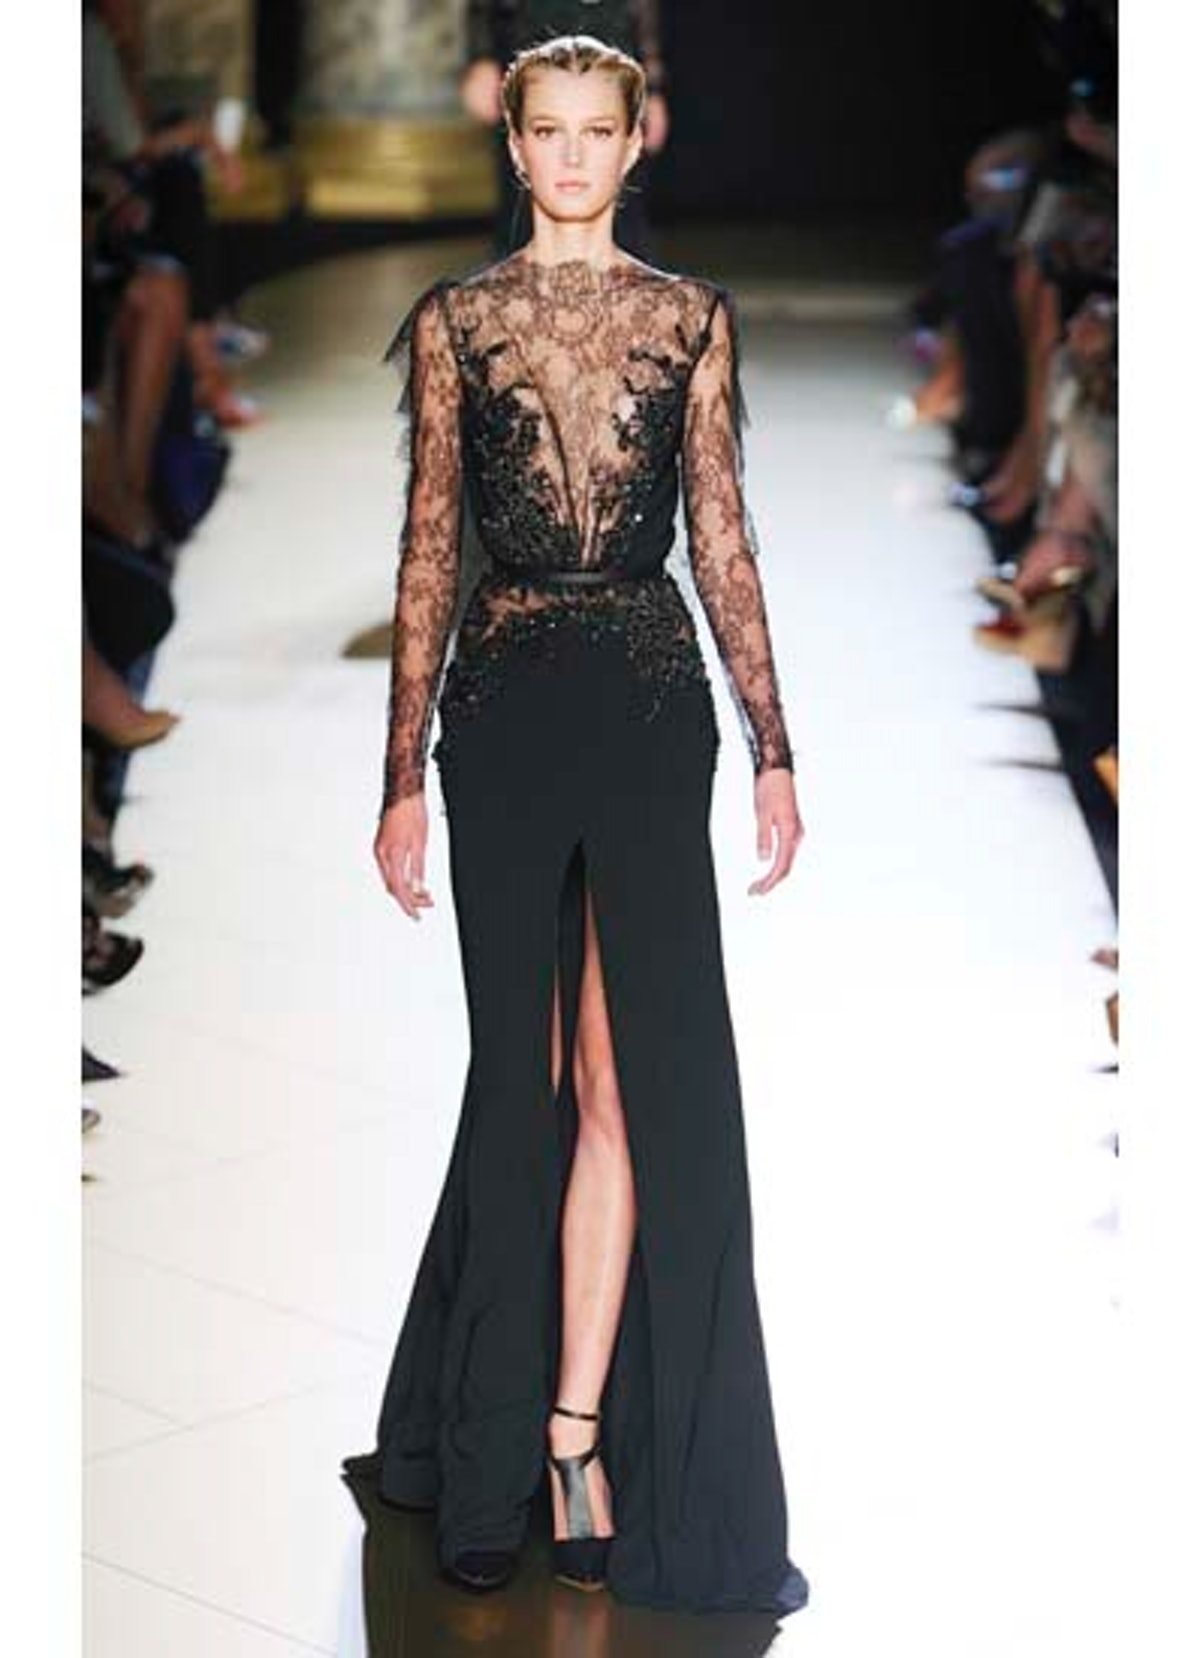 fass-elie-saab-couture-2012-runway-02-v.jpg